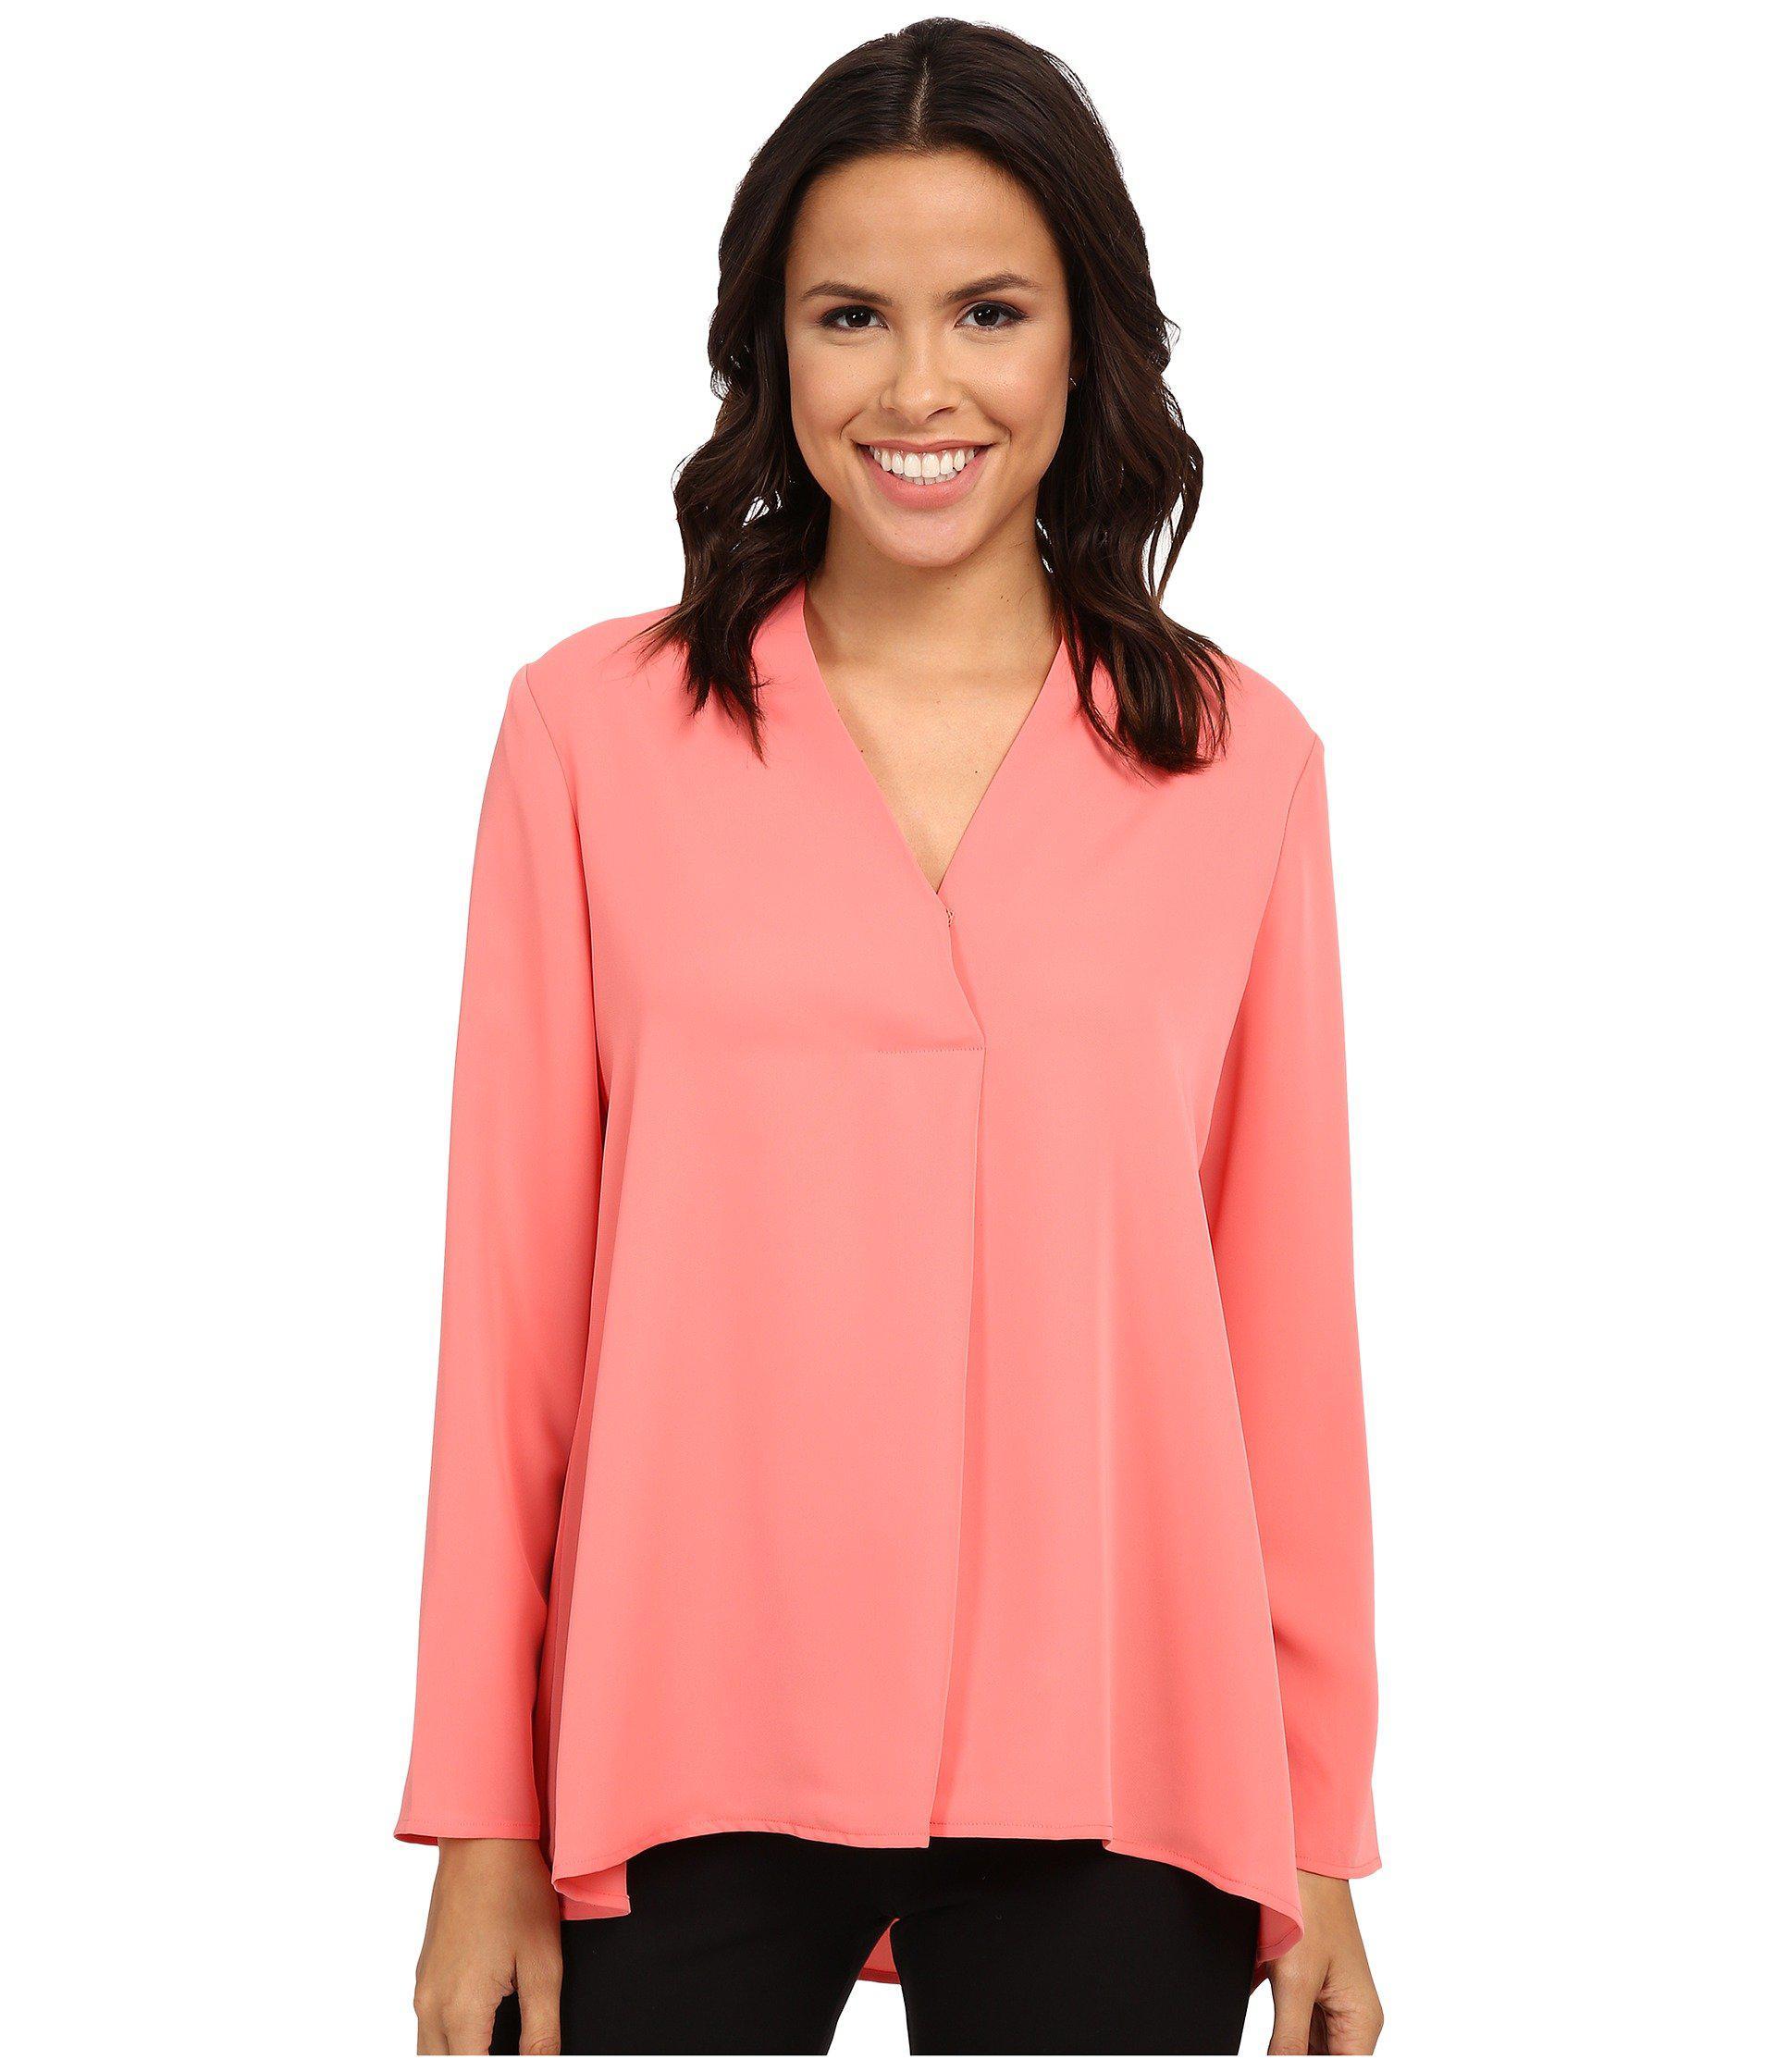 27f2c80efc1 Lyst - NIC+ZOE Majestic Matte Shirt in Pink - Save 75%